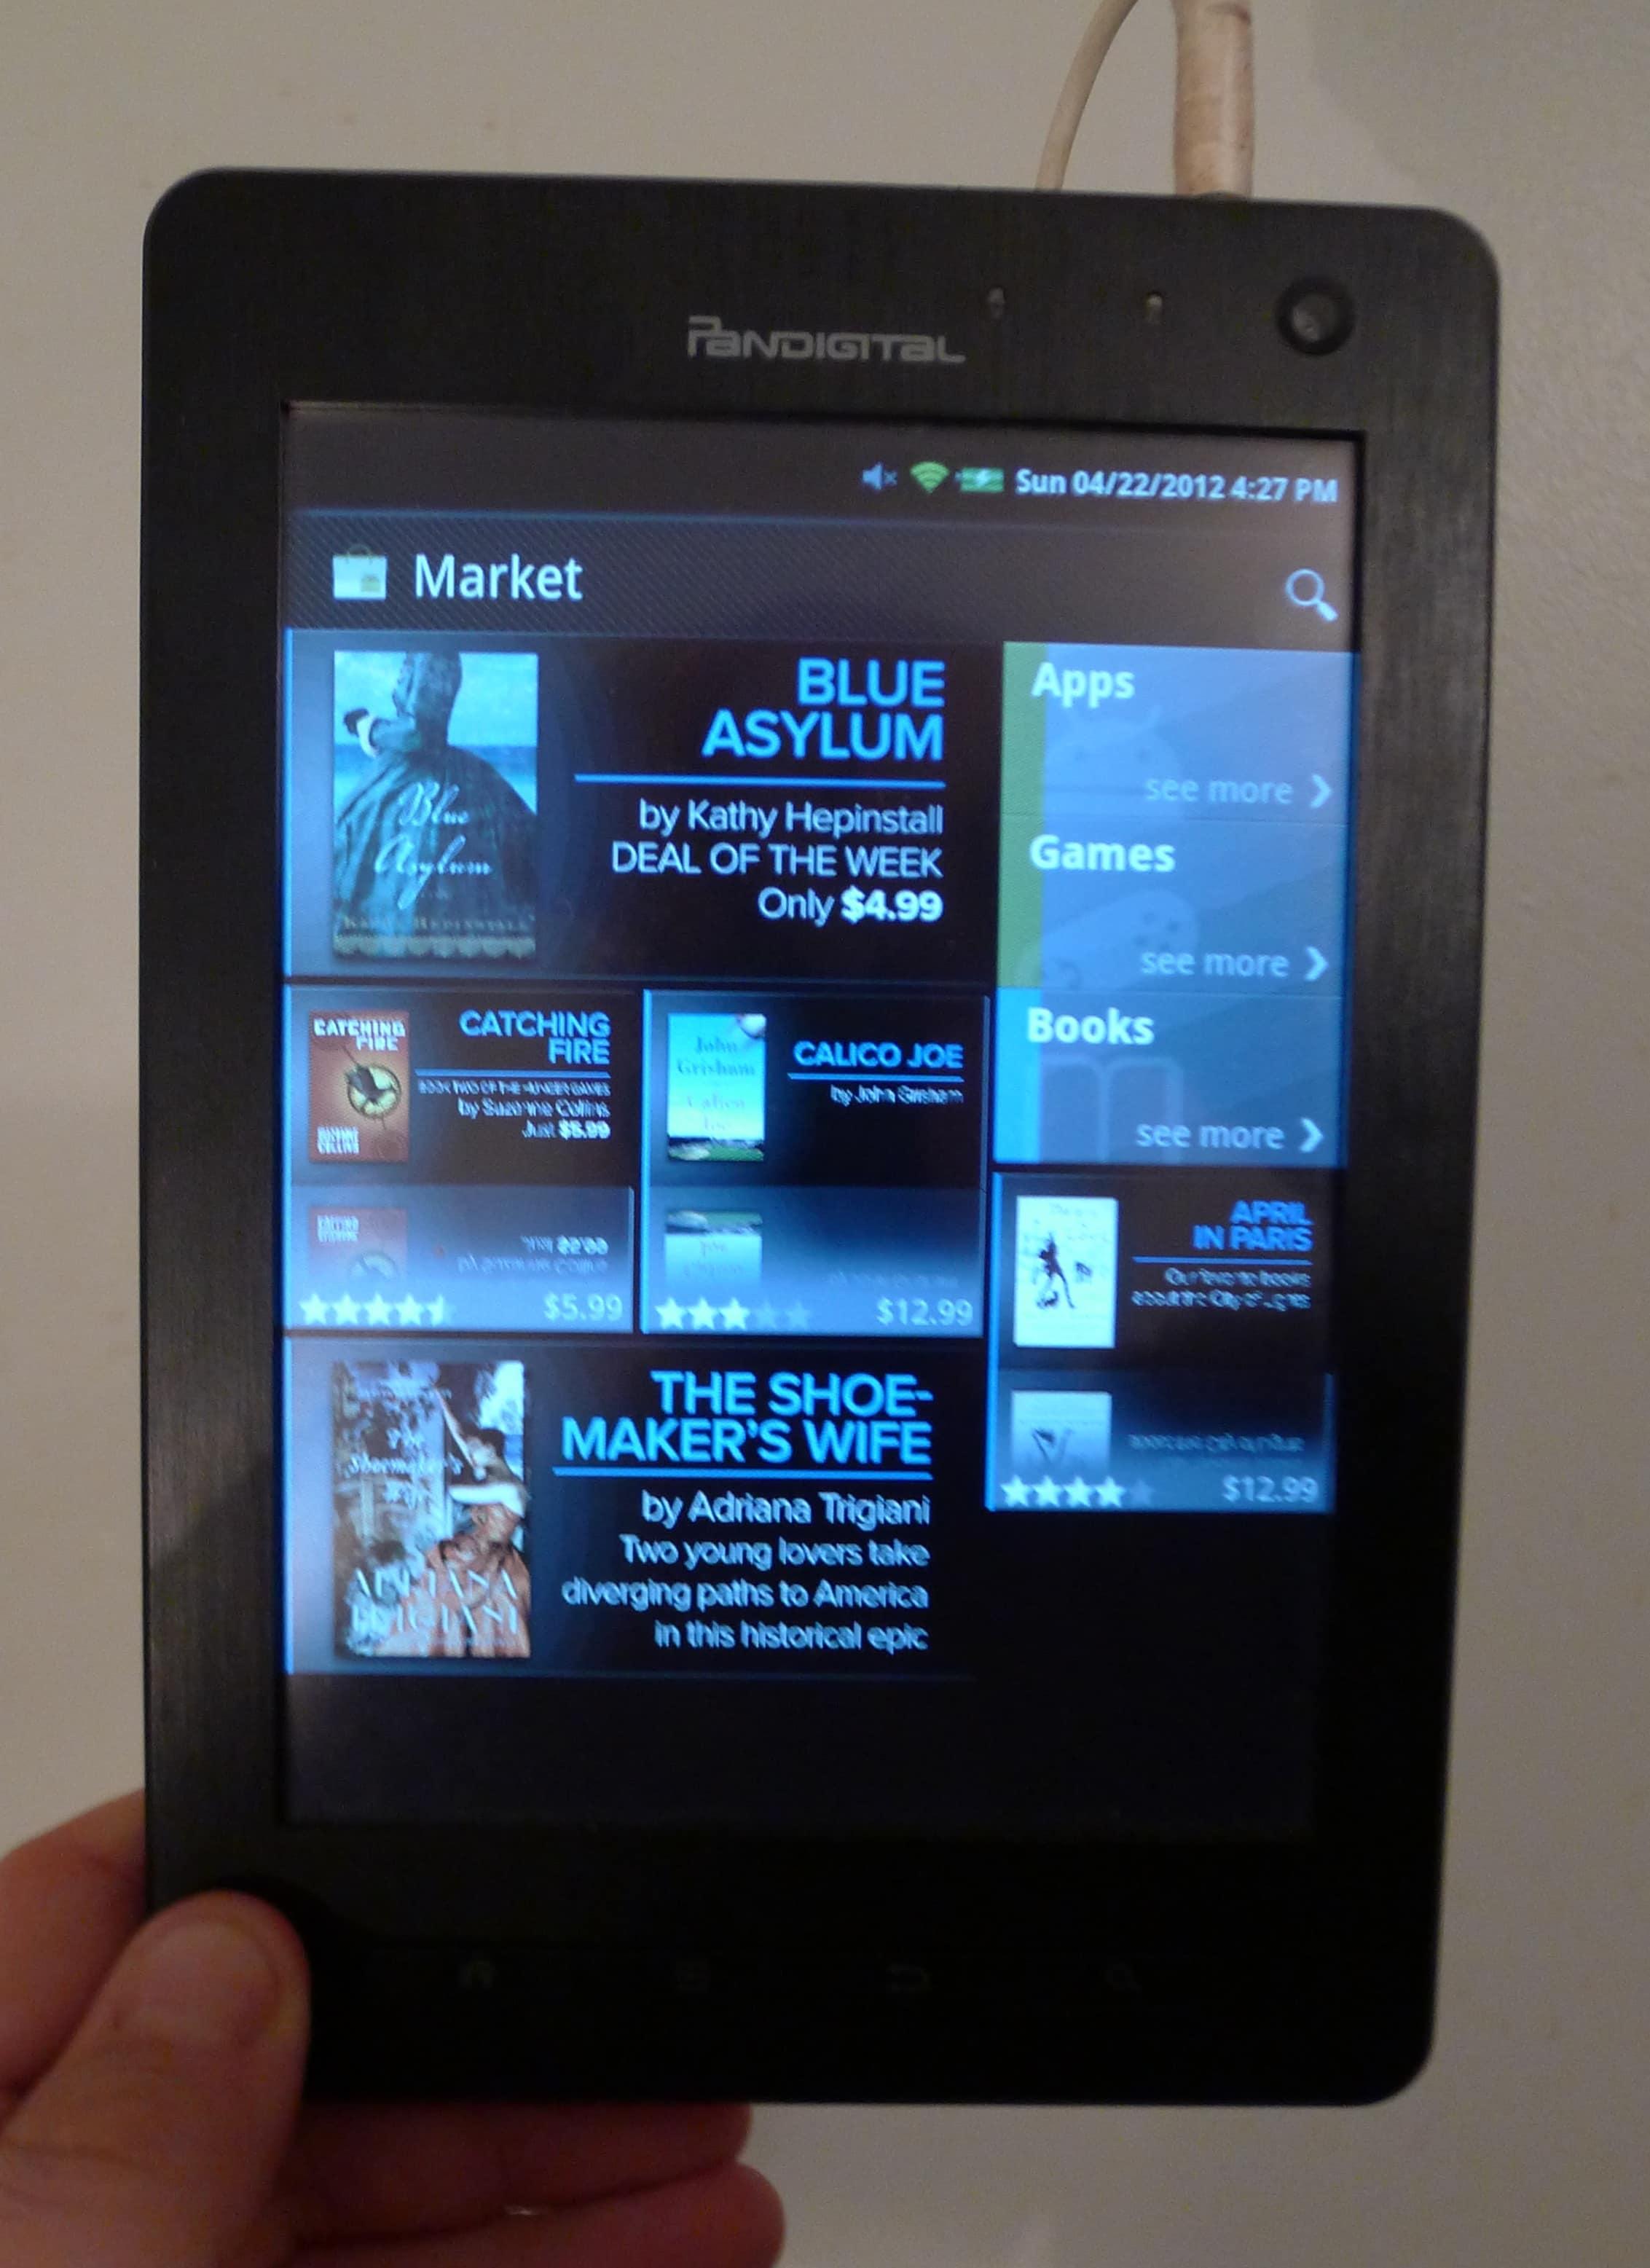 how to install android market on pandigital nova supernova the easy rh the digital reader com Pandigital Novel Precios Pandigital Novel 4GB